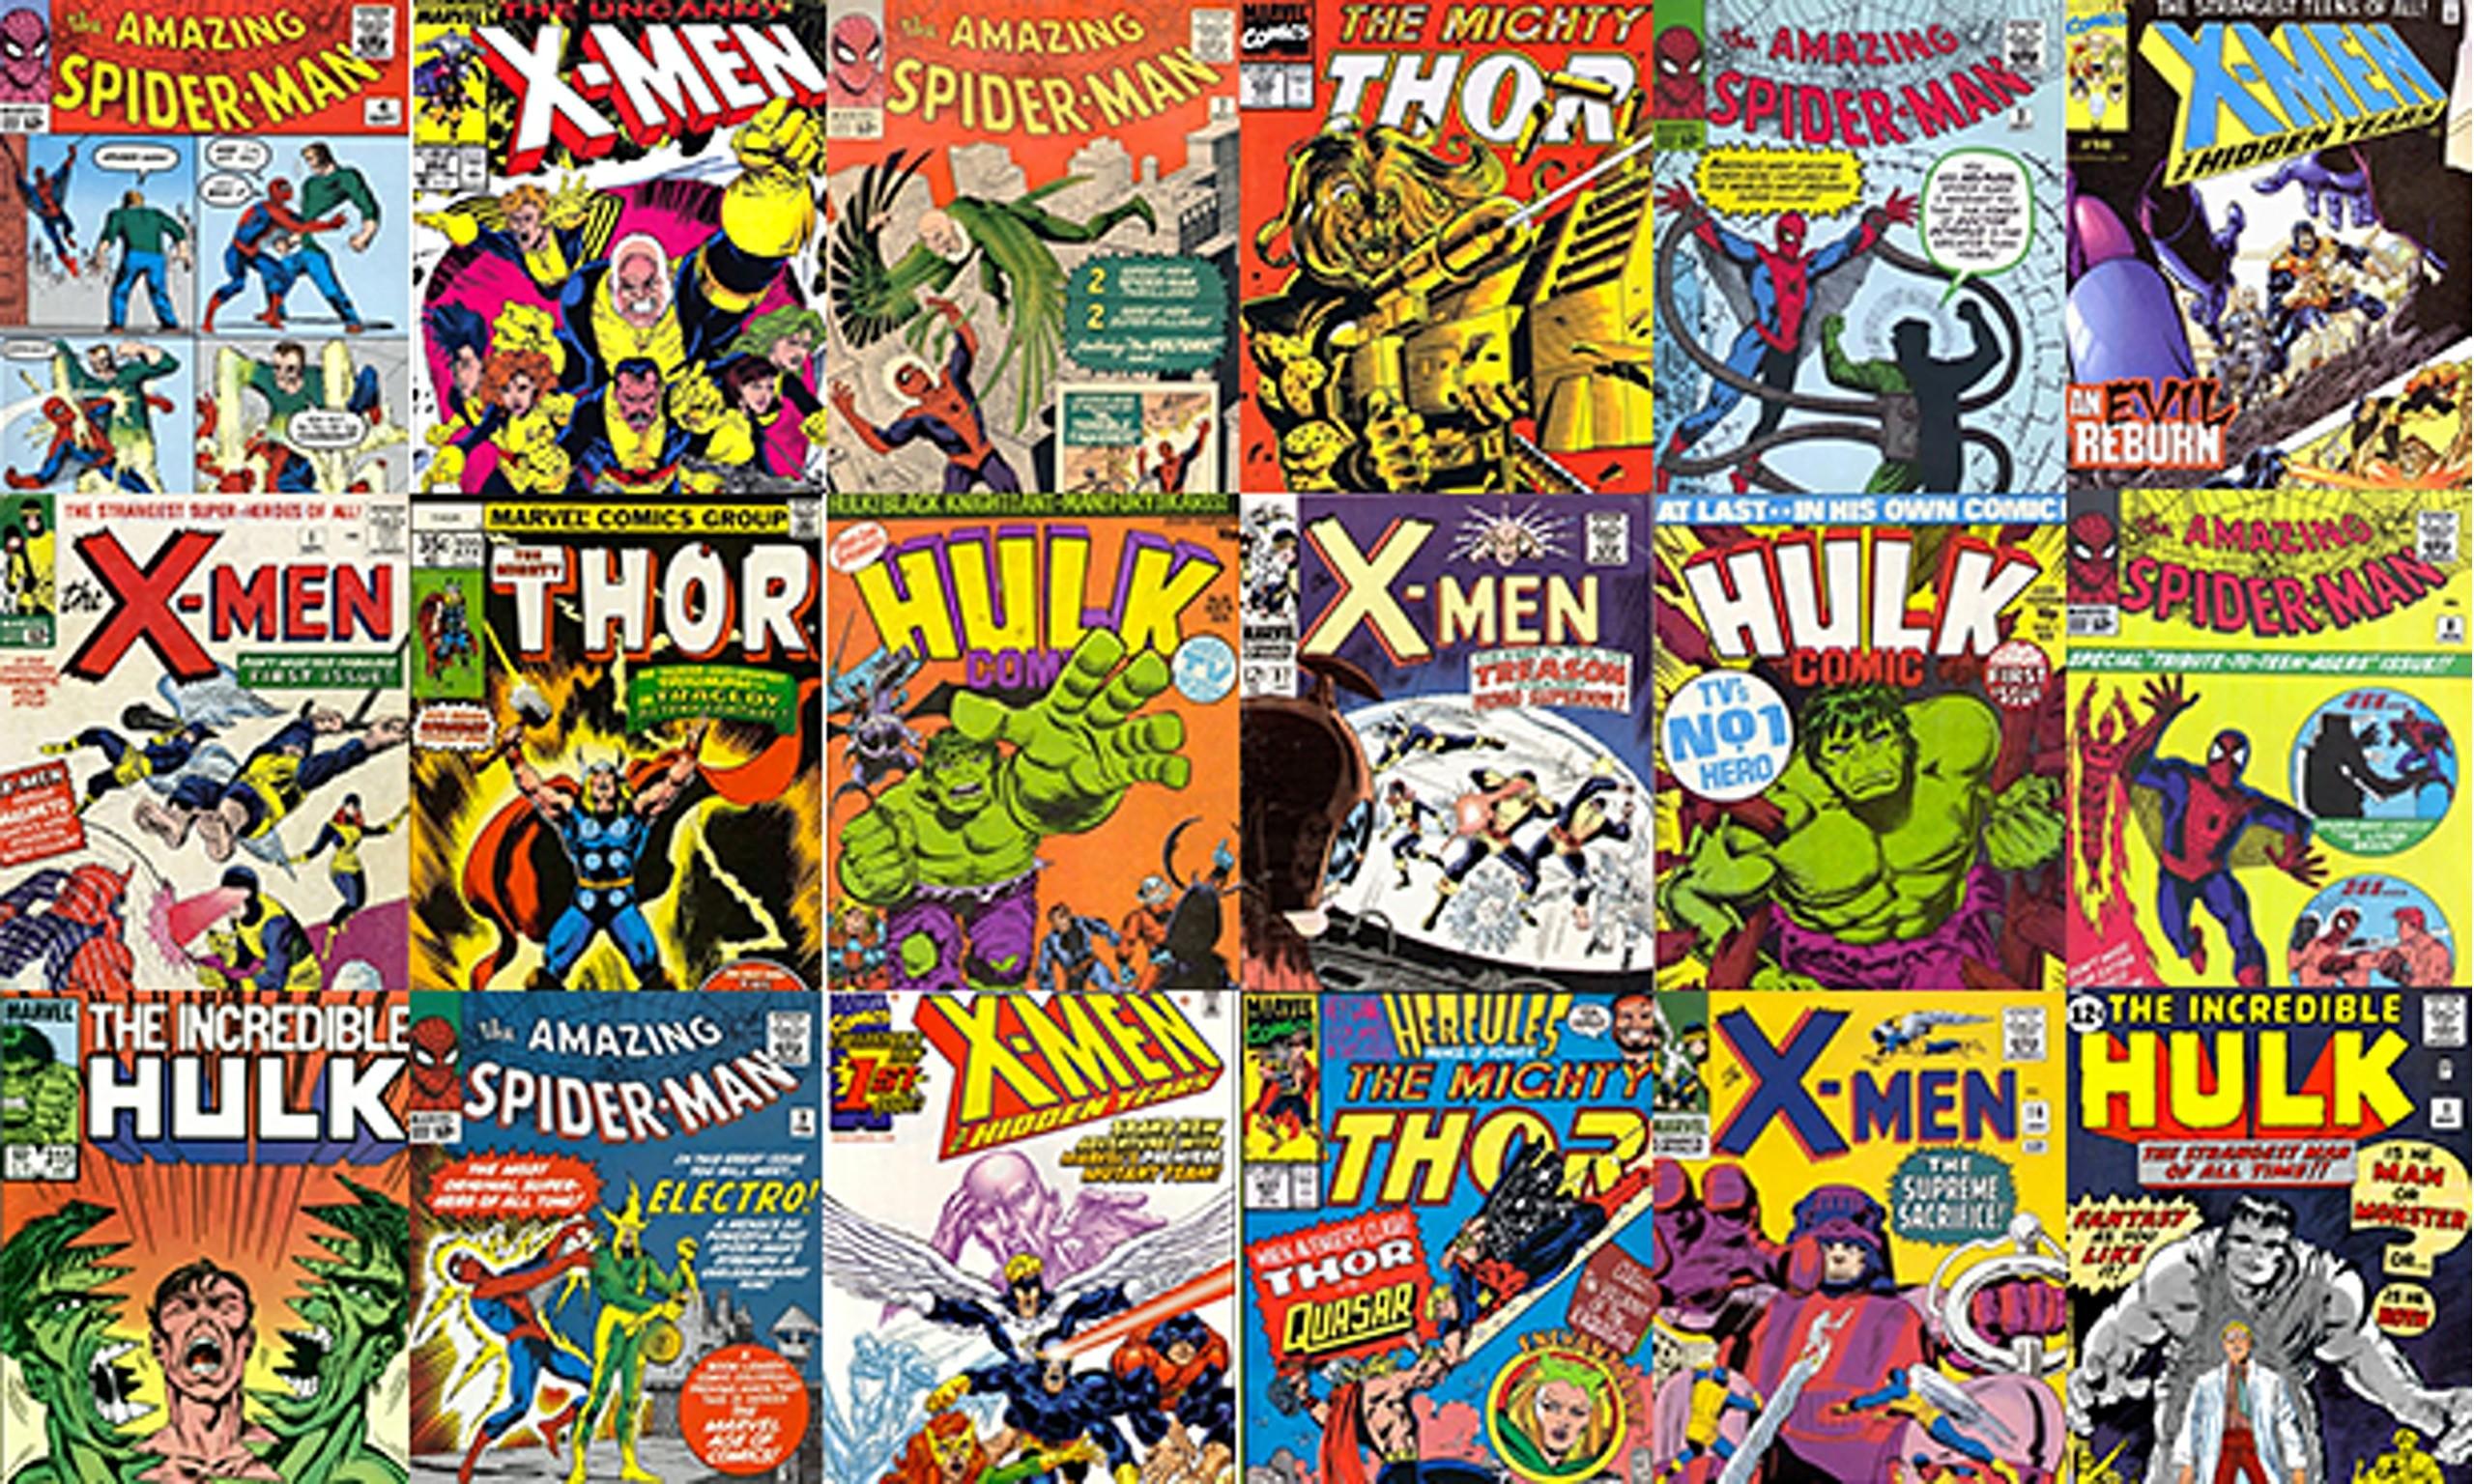 marvel comic book covers wallpaper – photo #9. Libro electrónico Wikipedia  la enciclopedia libre